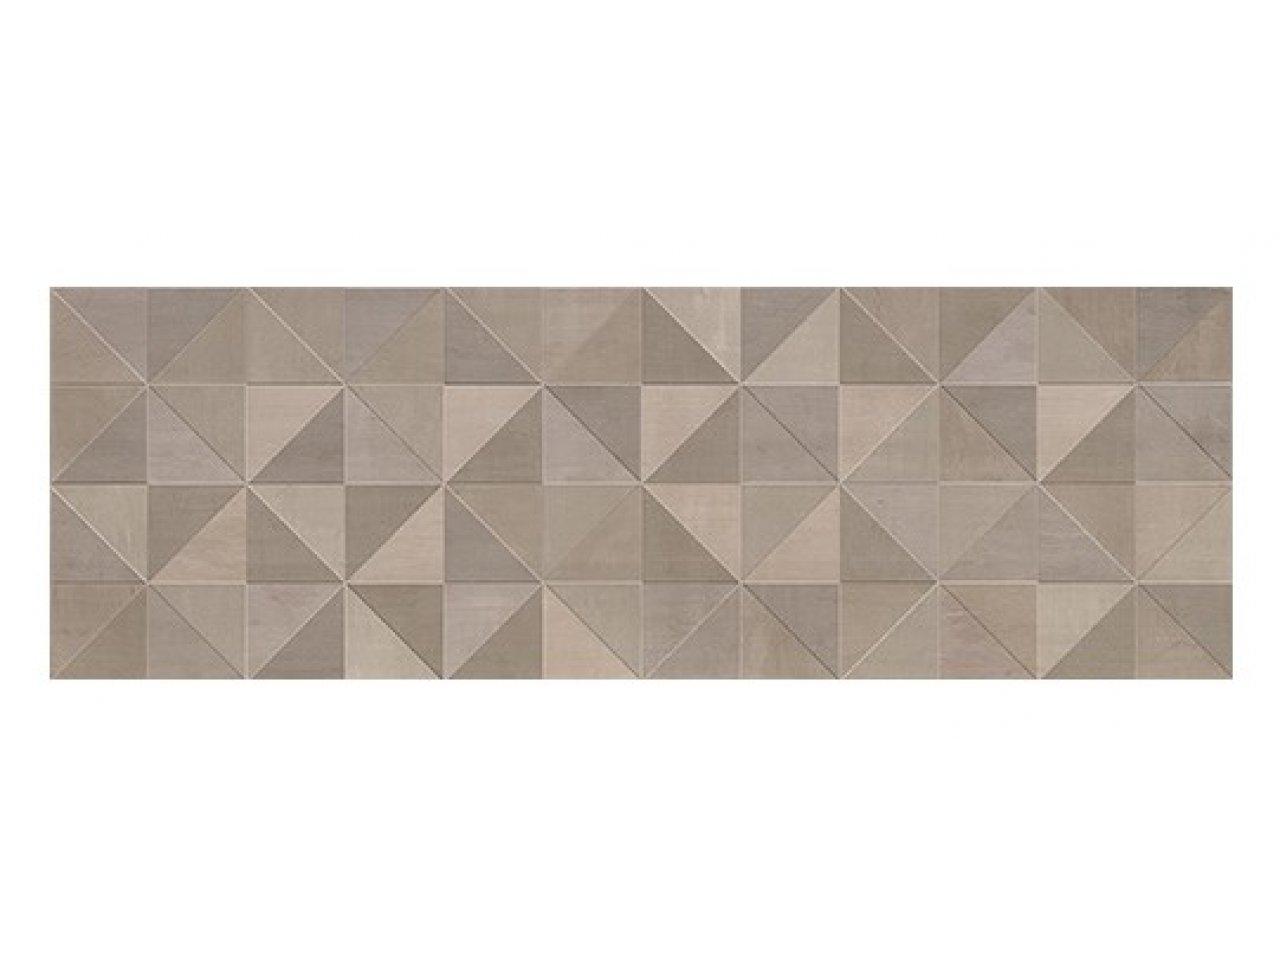 Настенная плитка FAP Color Now Tangram Fango Inserto 30.5x91.5 см, Арт. fMUE